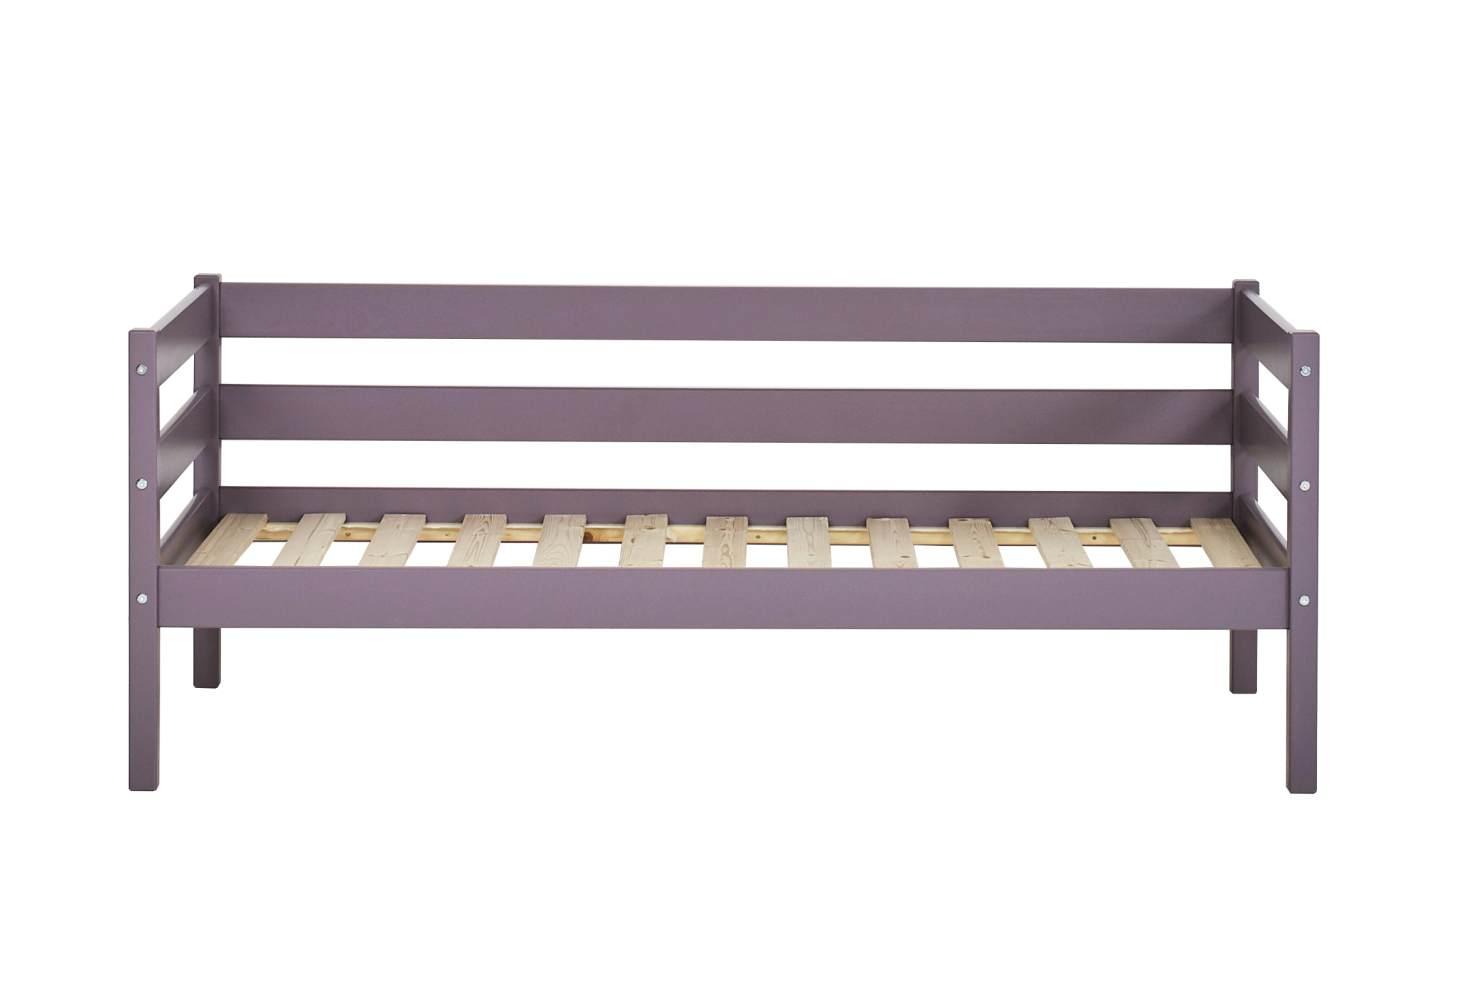 Hoppekids 'Ida-Marie' Einzelbett, lavender, Kiefer massiv, inkl. Rolllattenrost, 70x160cm, nachhaltig Bild 1